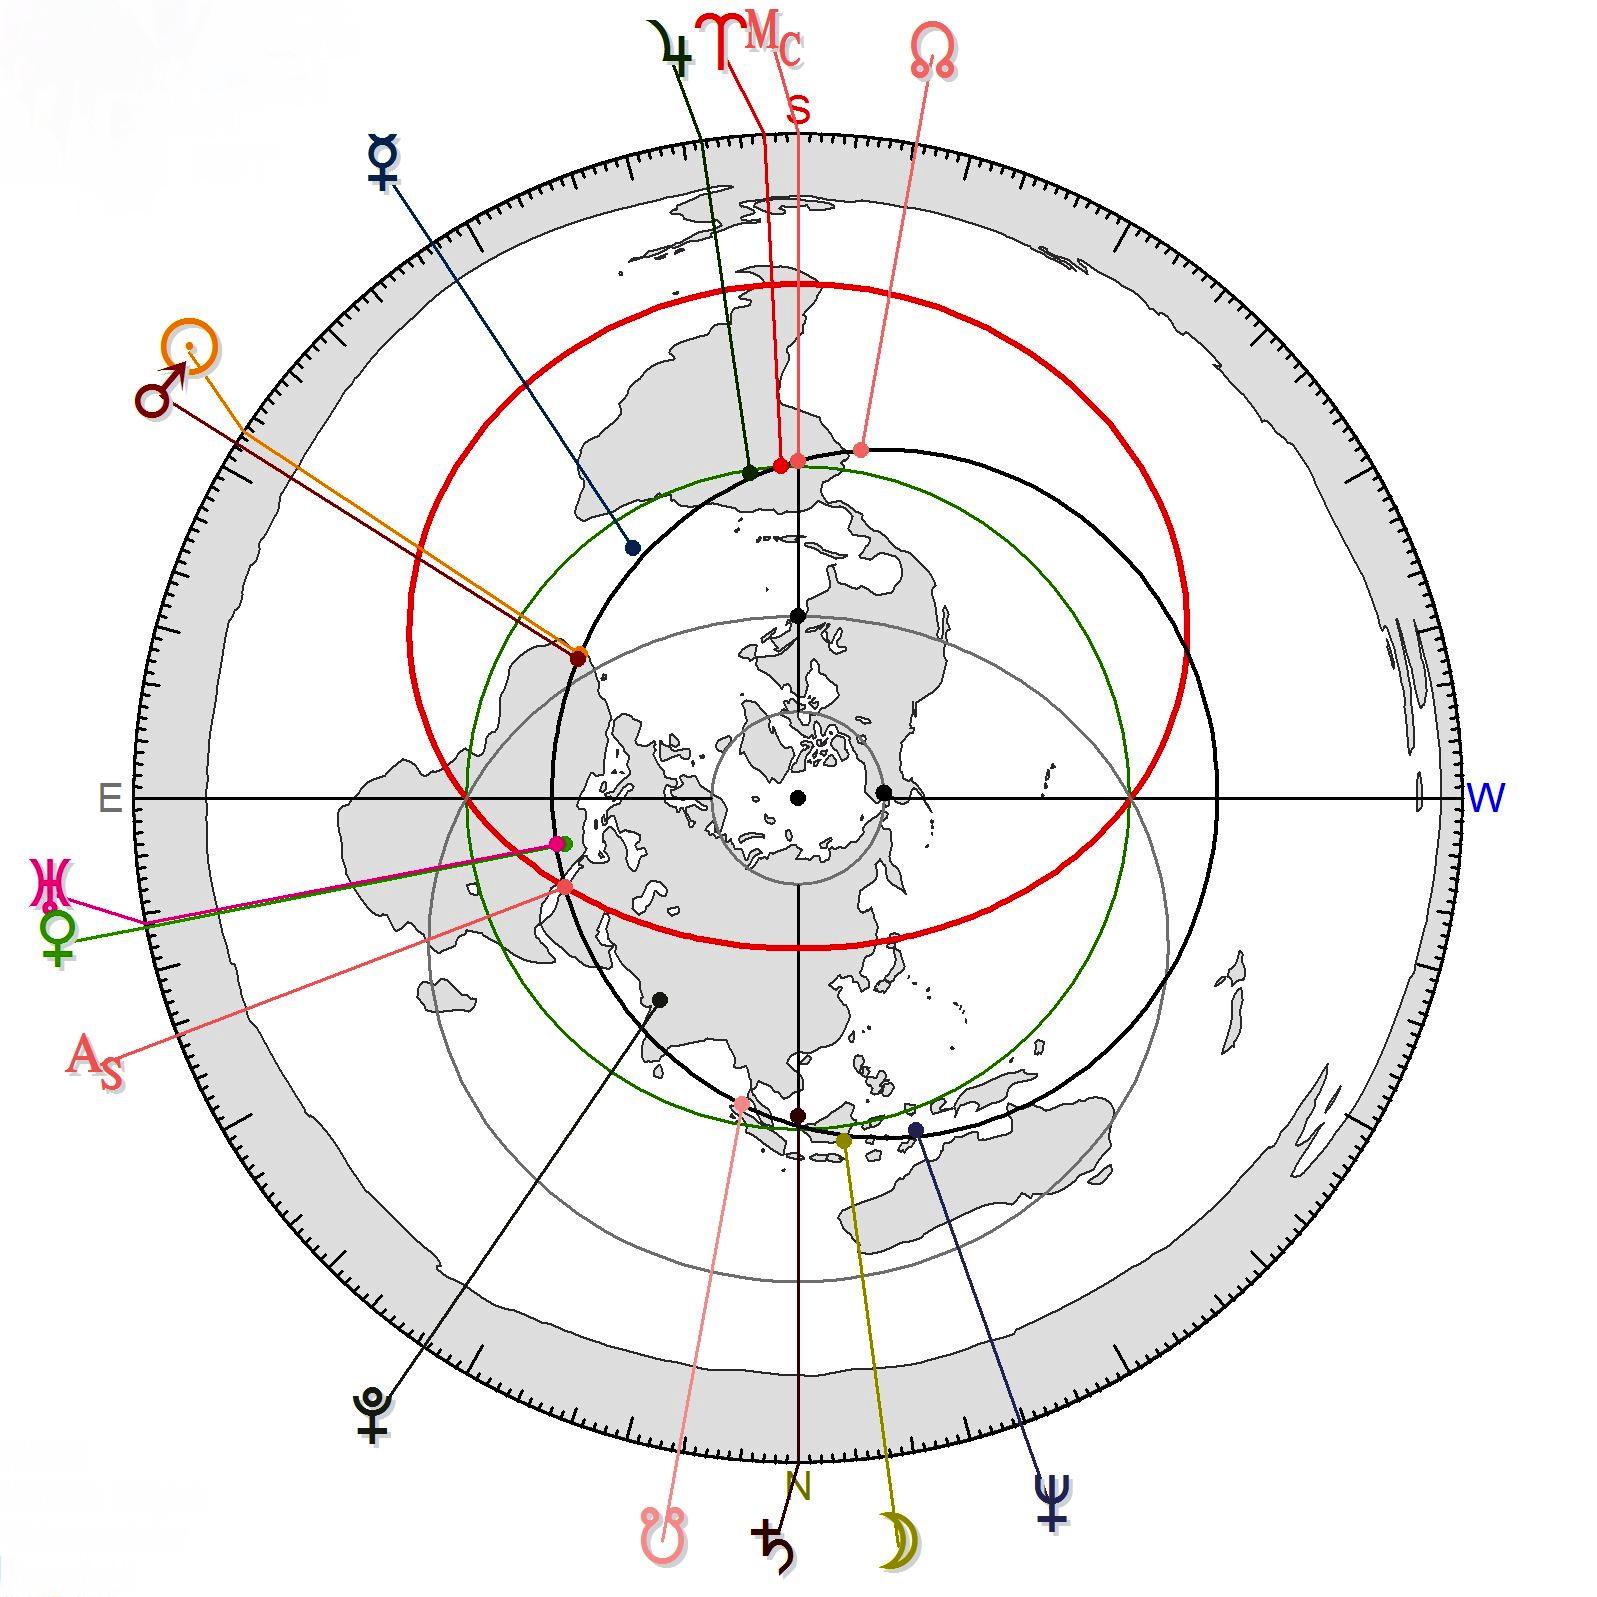 Polar Azimuthal Equidistant Projection